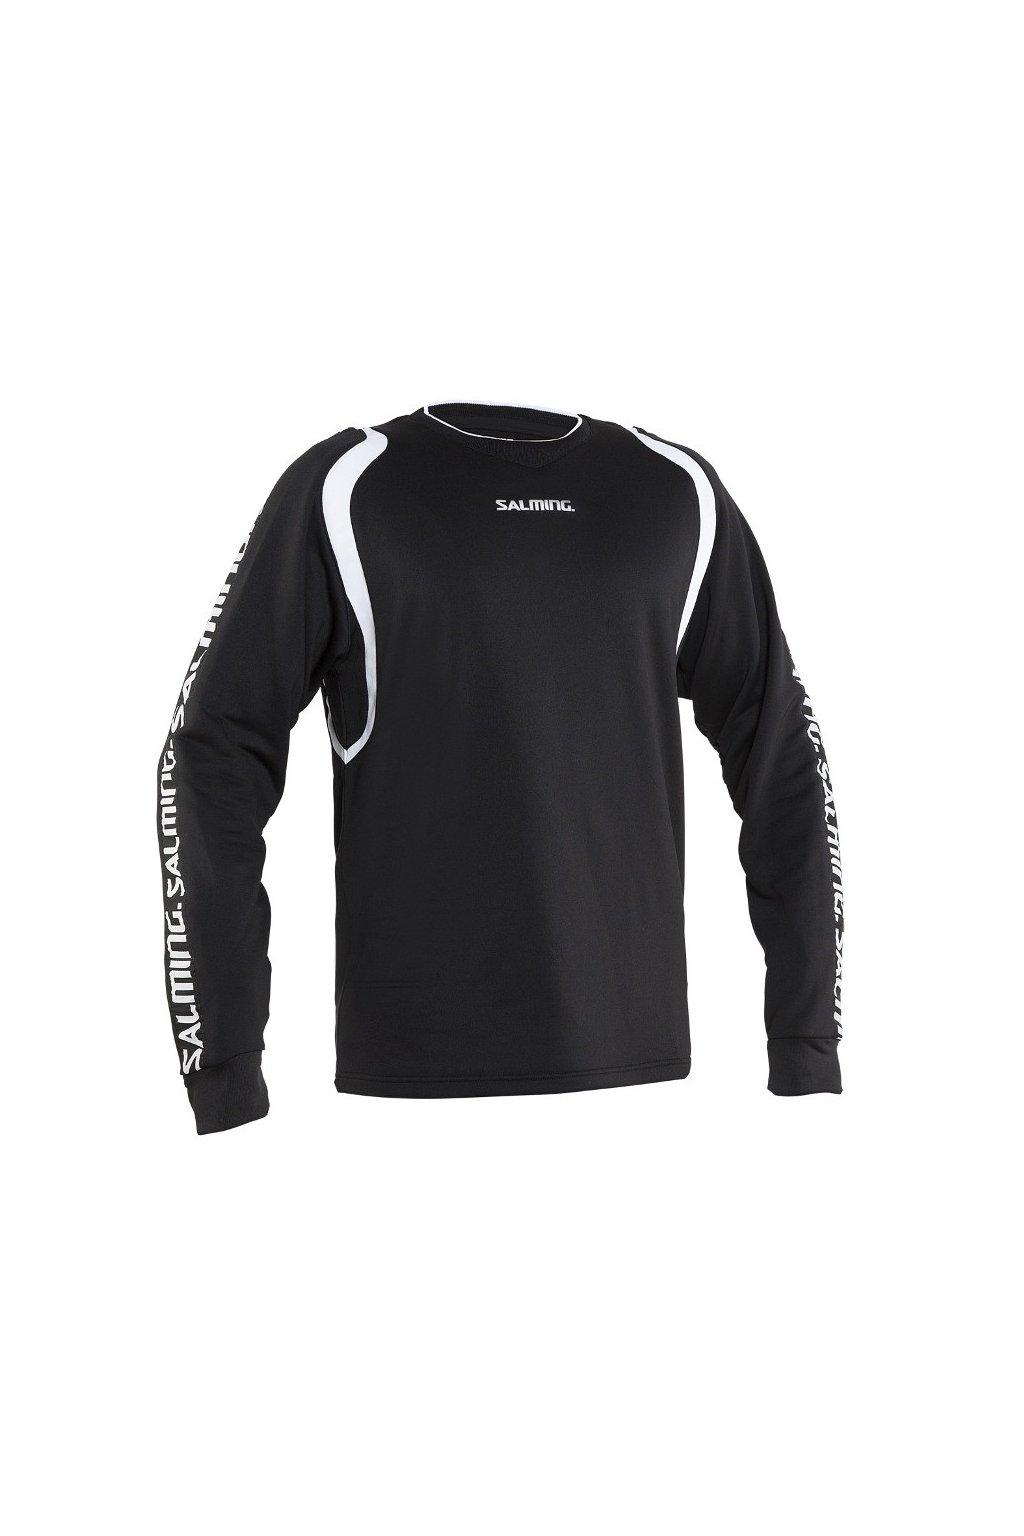 salming agon ls jersey (4)